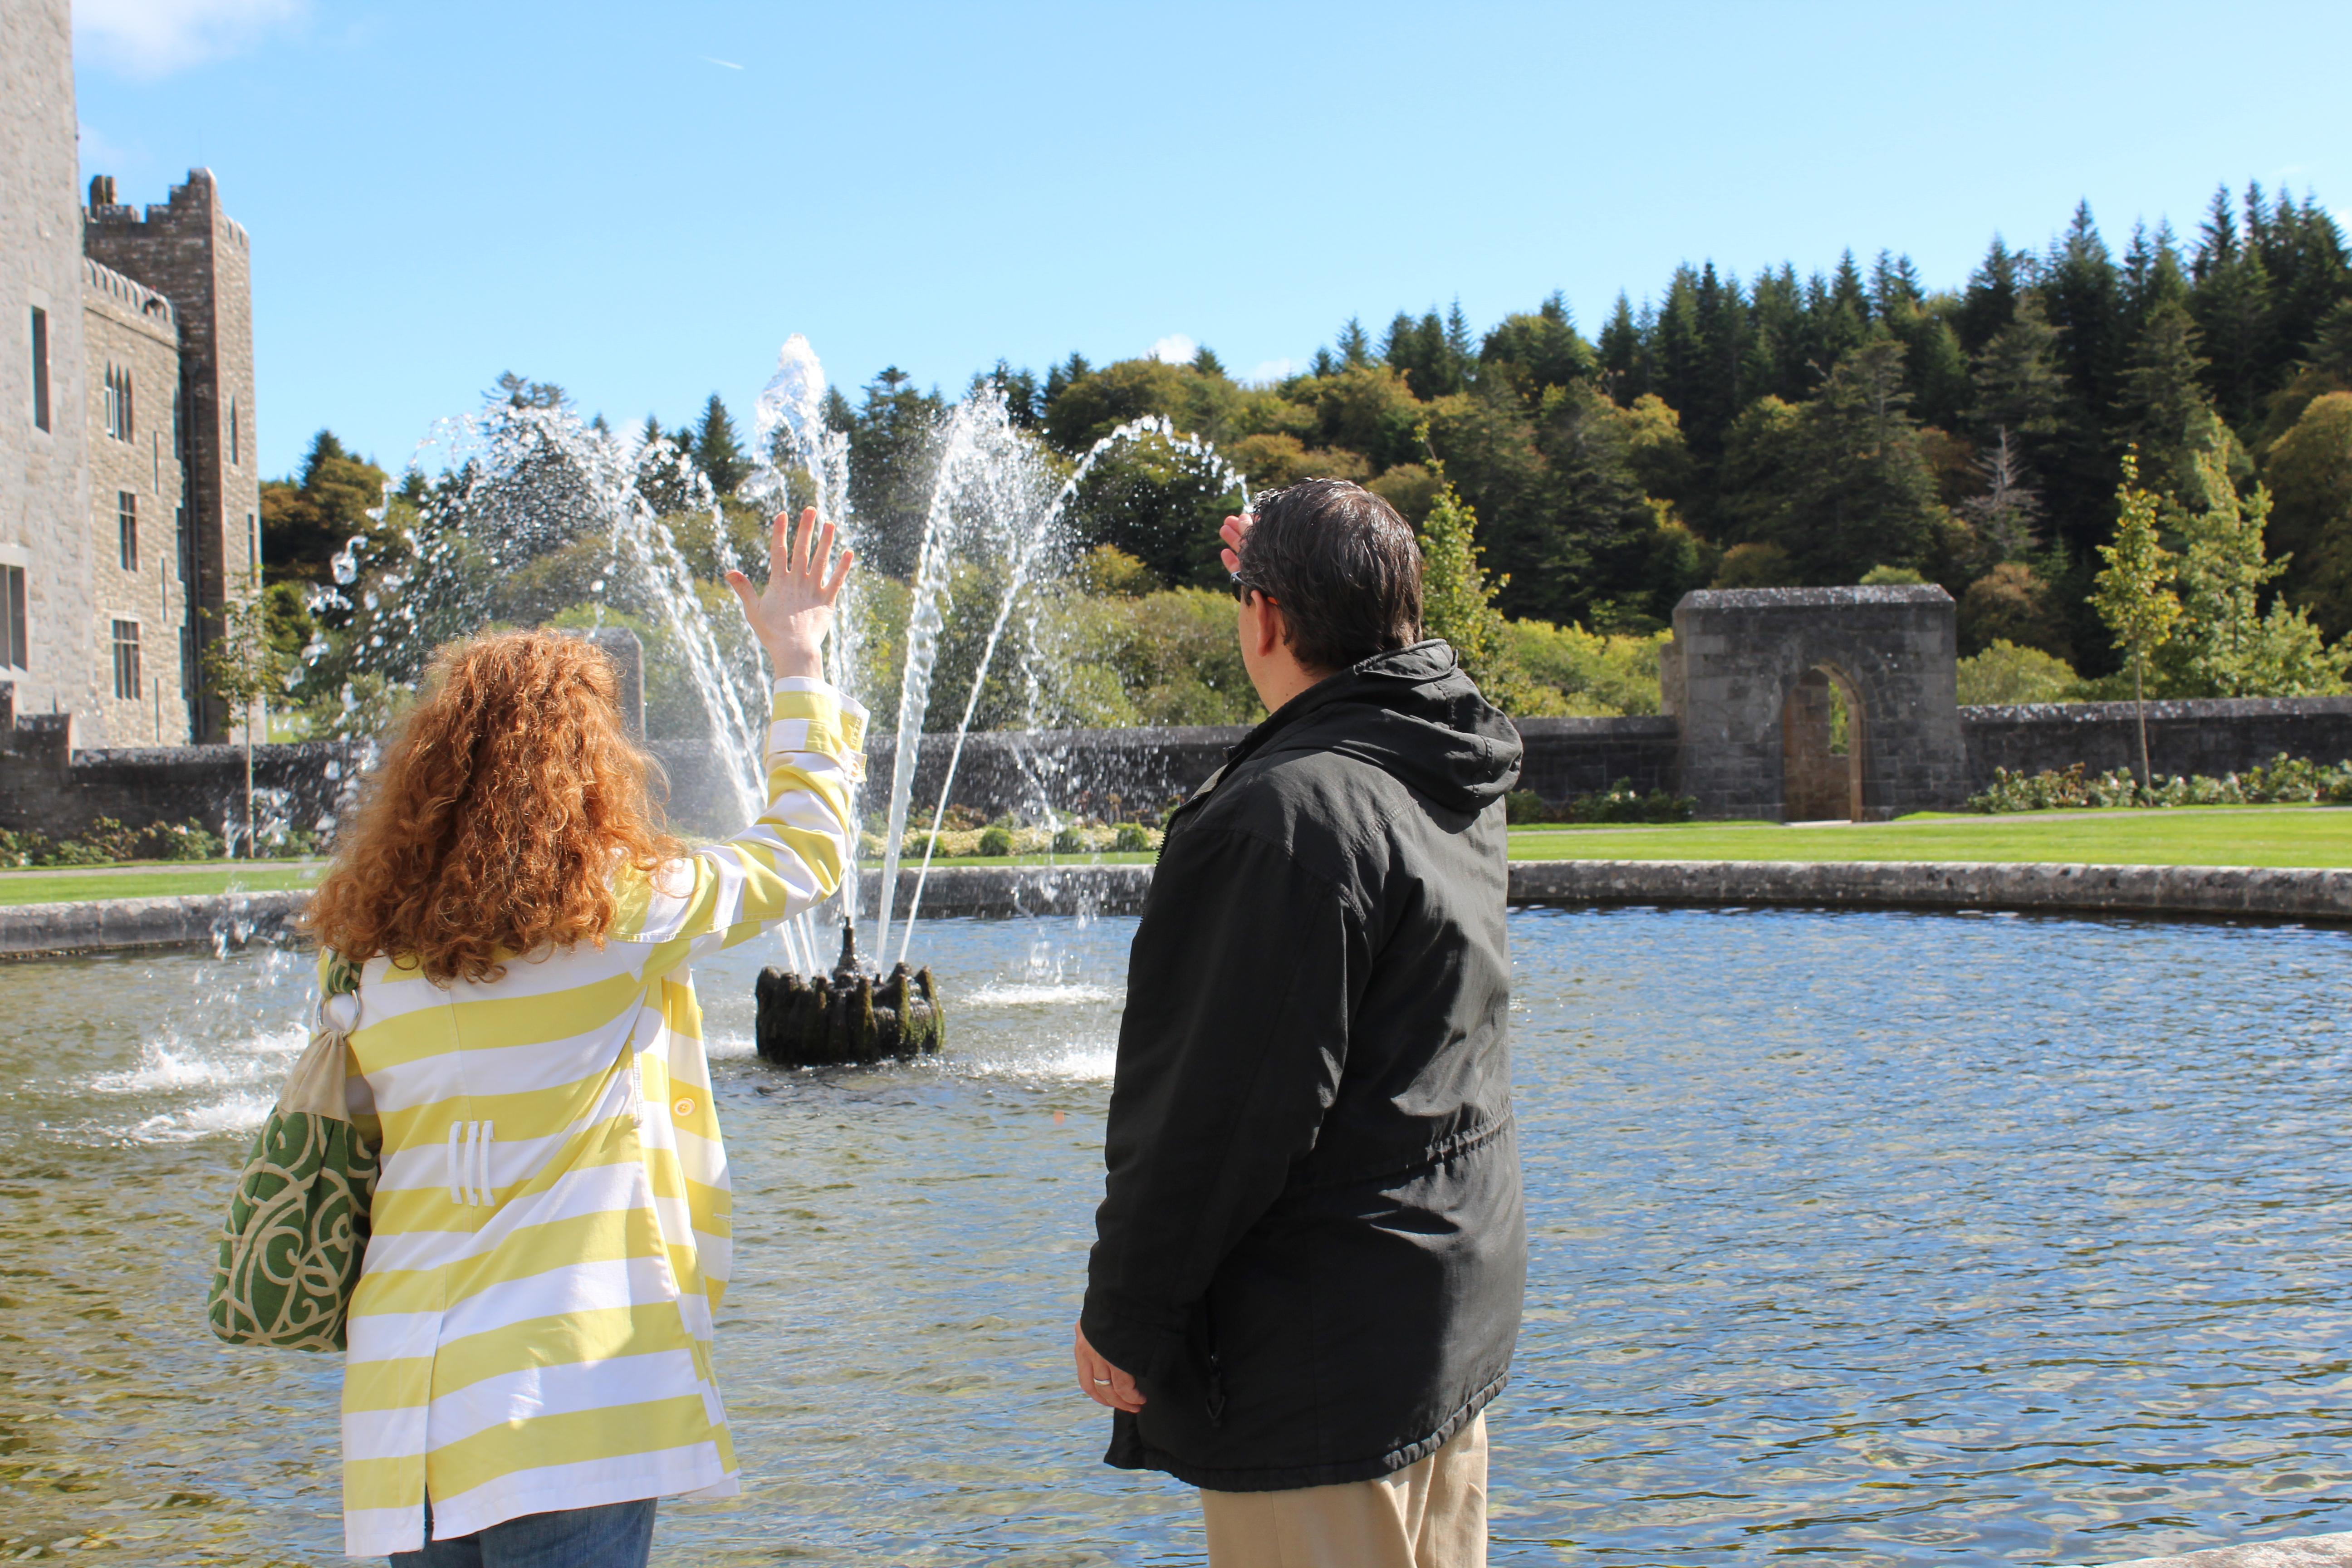 ashford castle fountain wish